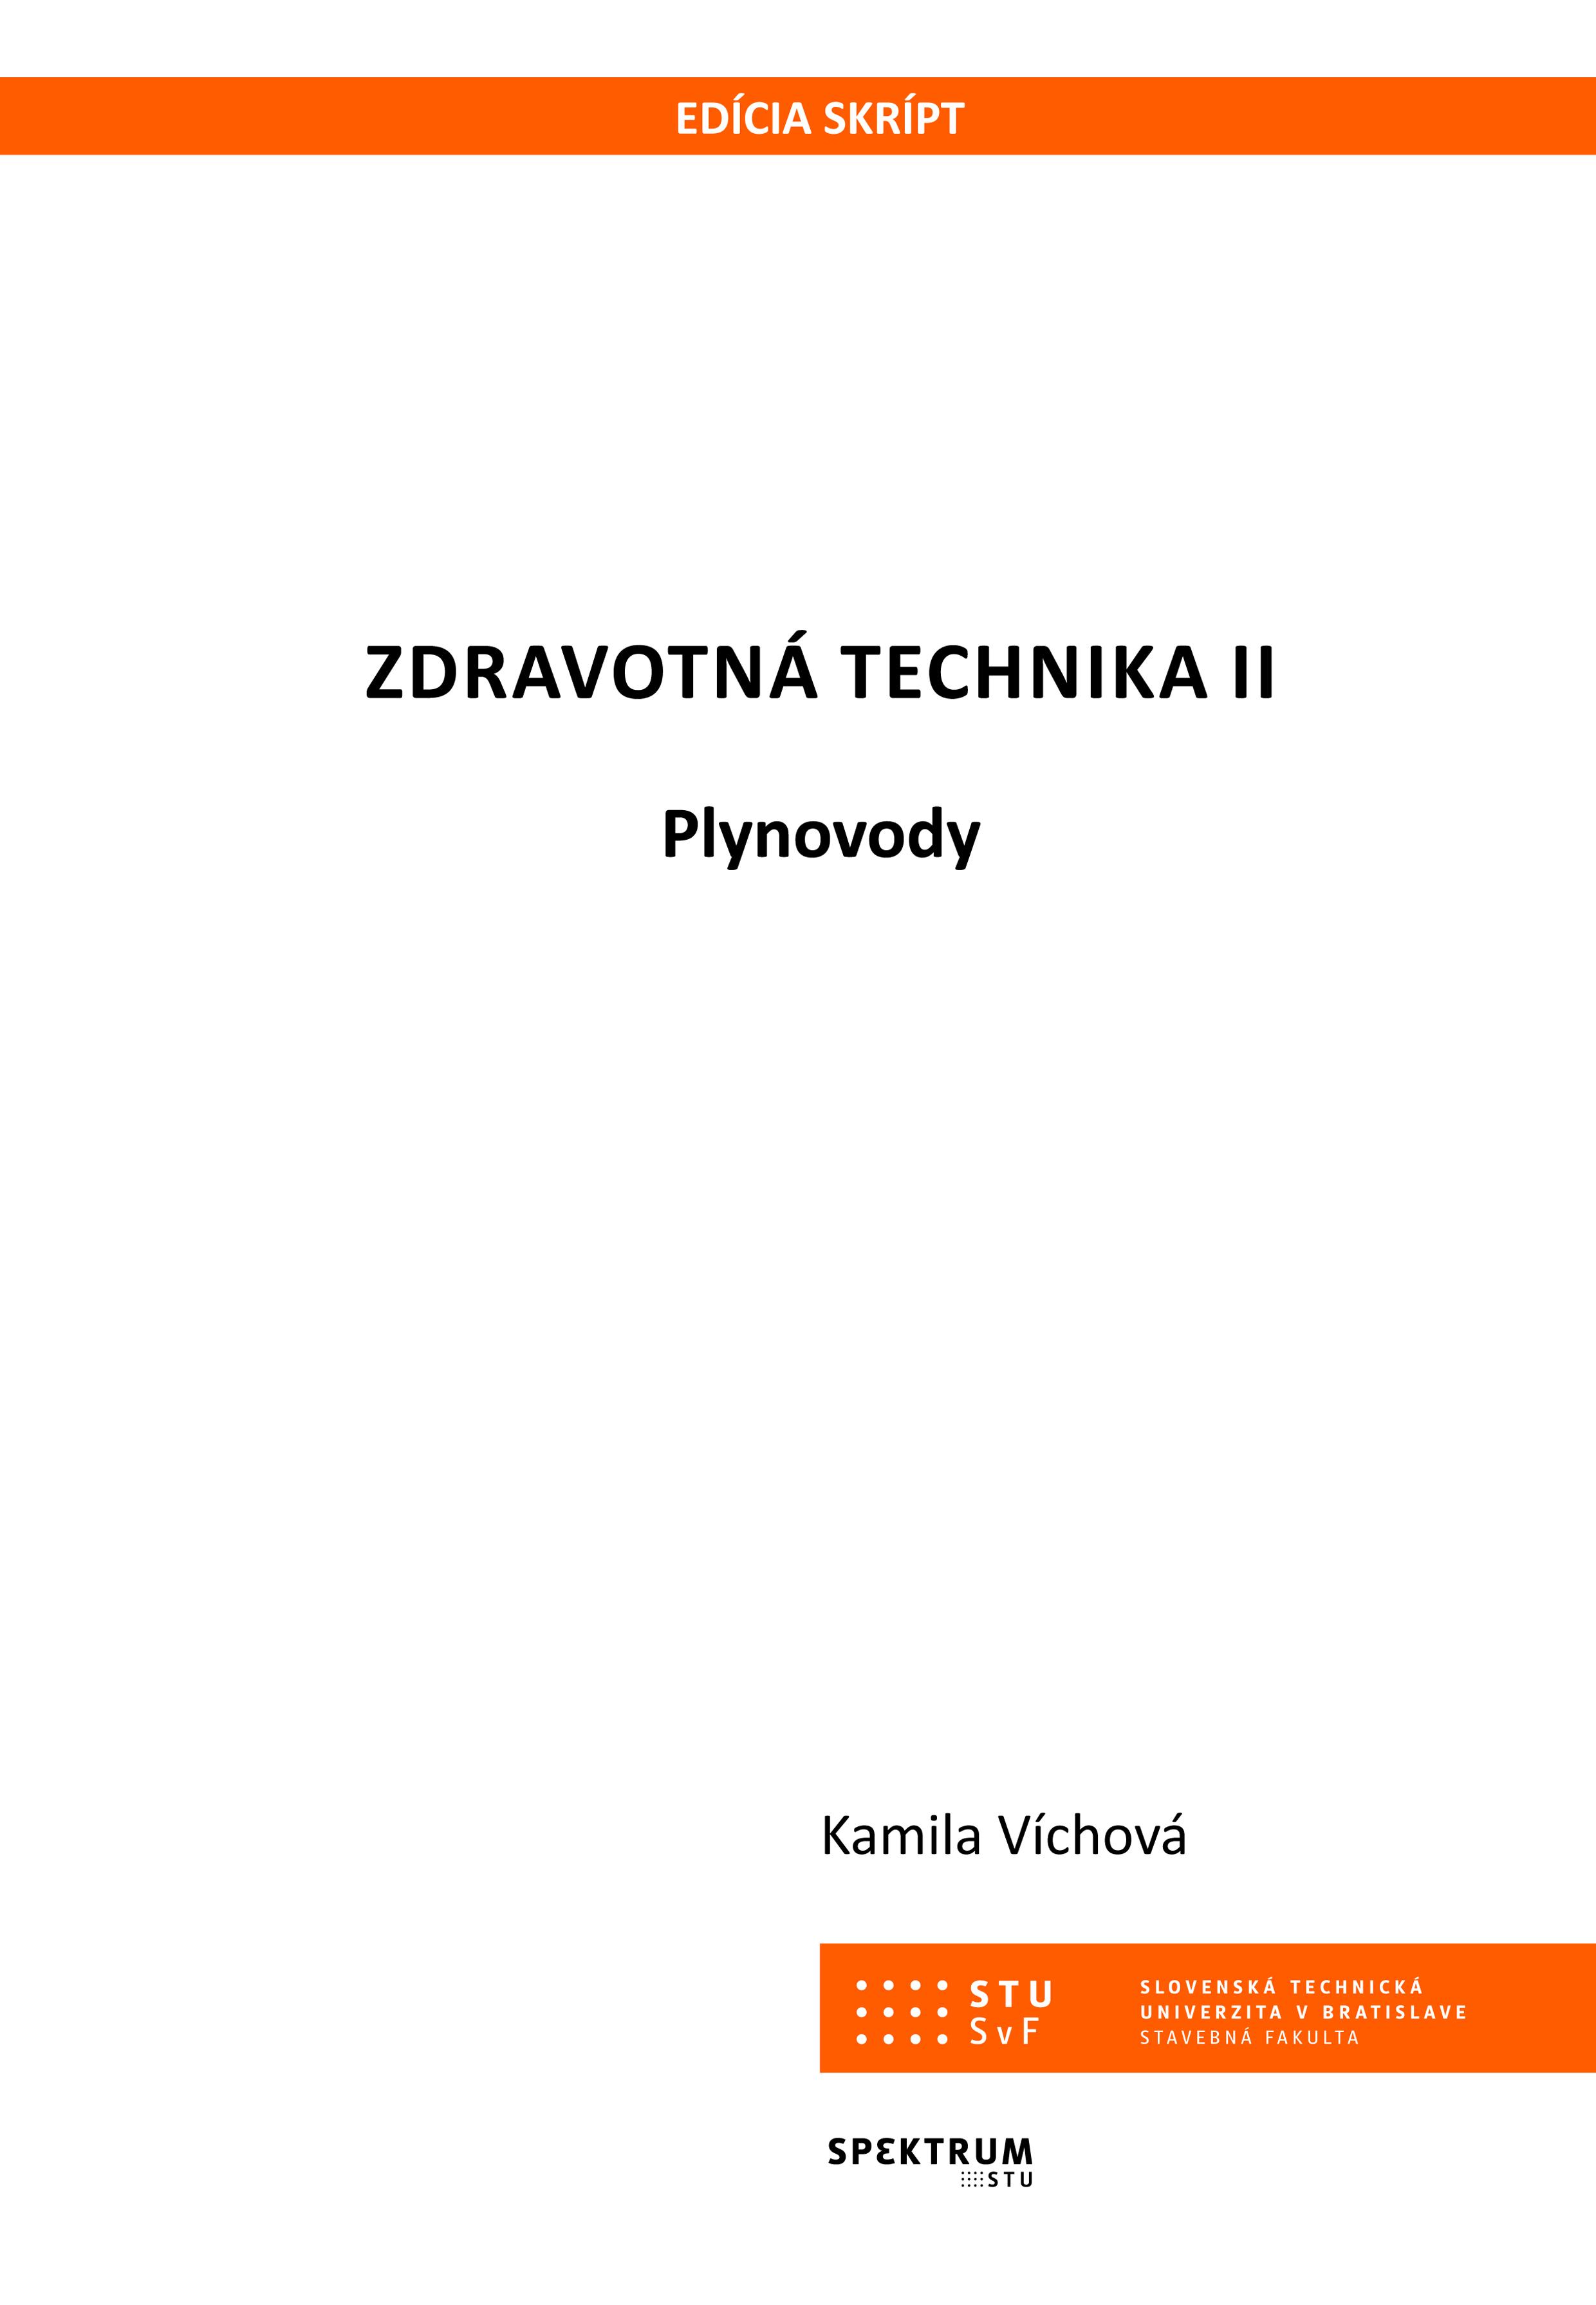 Zdravotná technika II. Plynovody 1